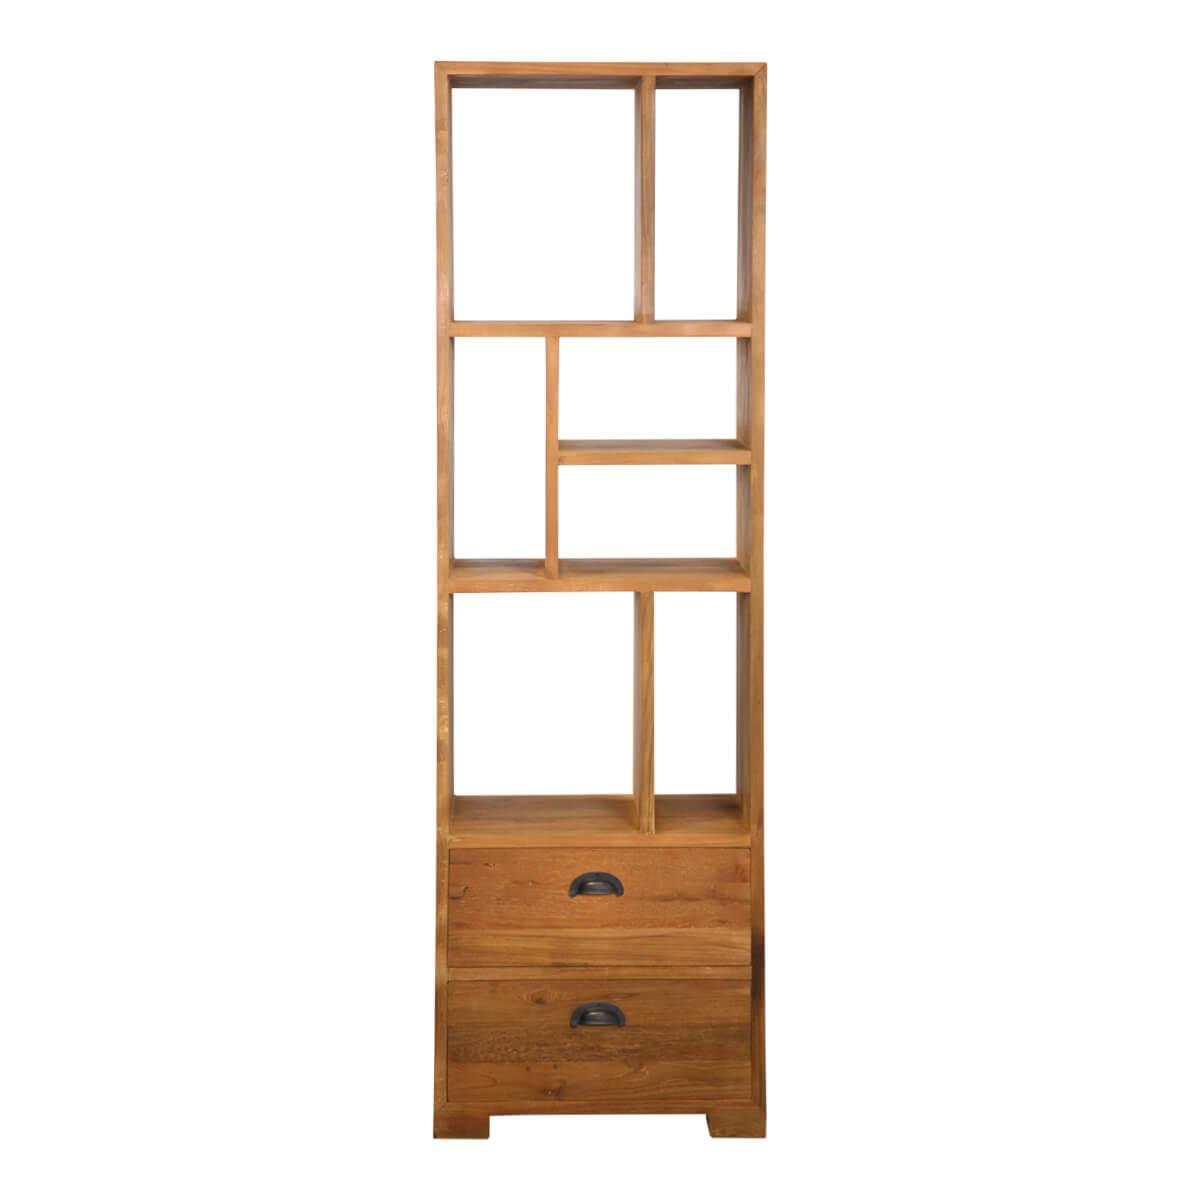 Reclaimed Teak Wood Asymmetrical Shelves Bookcase With Drawer